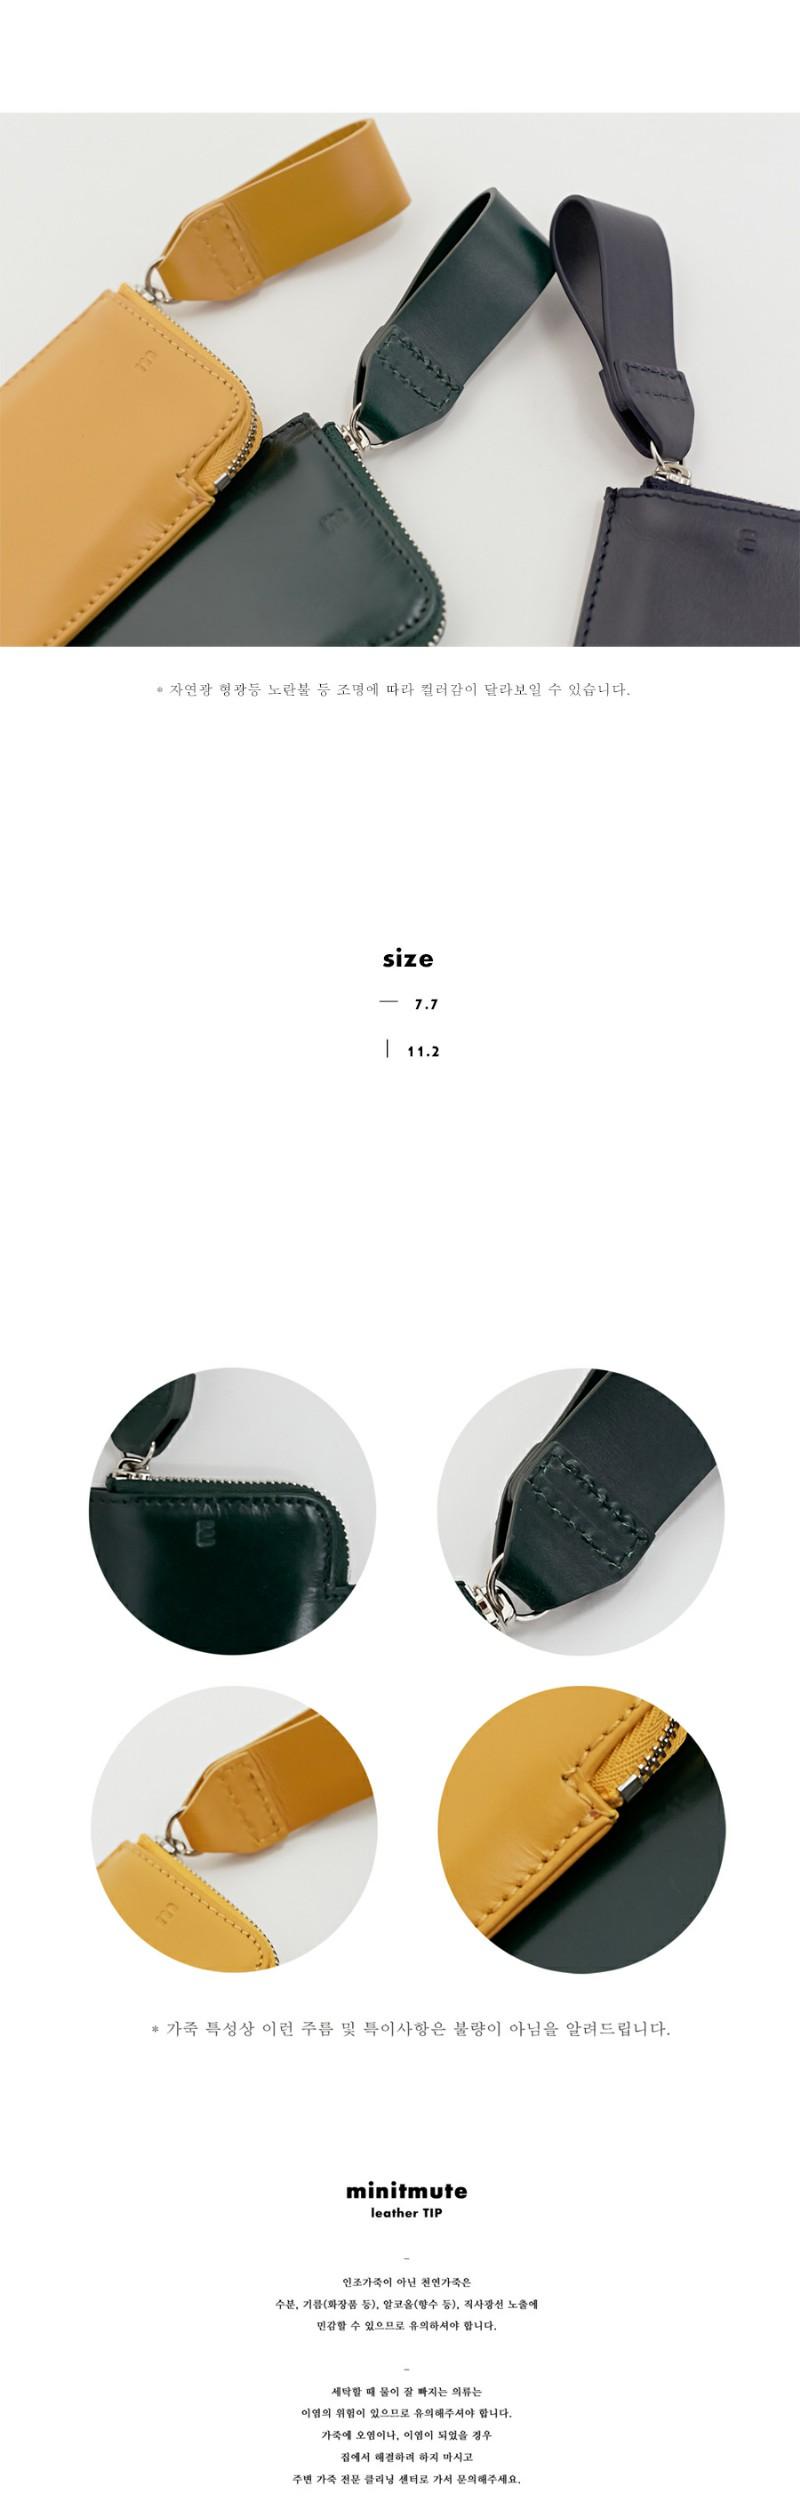 17 mm card wallet / spring